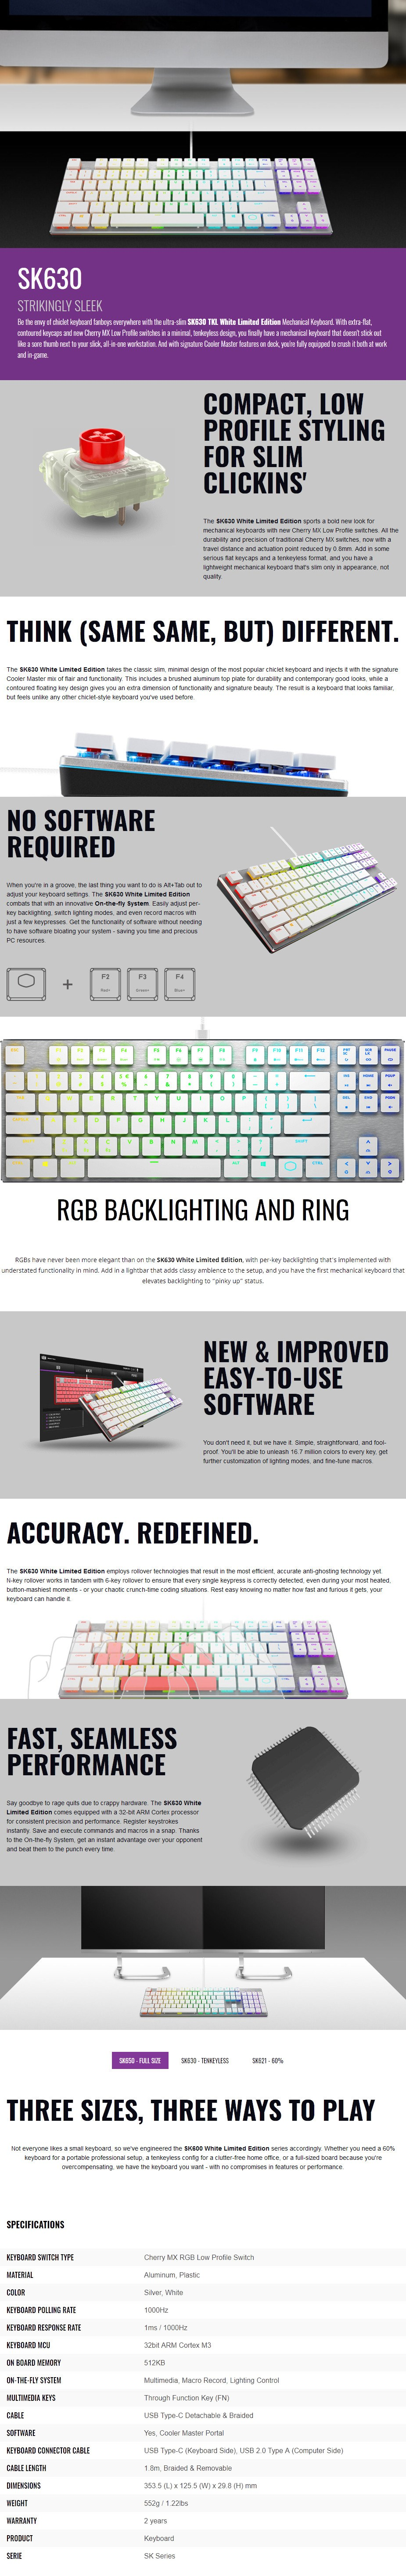 Cooler Master SK650 RGB TKL Low Profile Mechanical Gaming Keyboard - MX Red - Desktop Overview 1